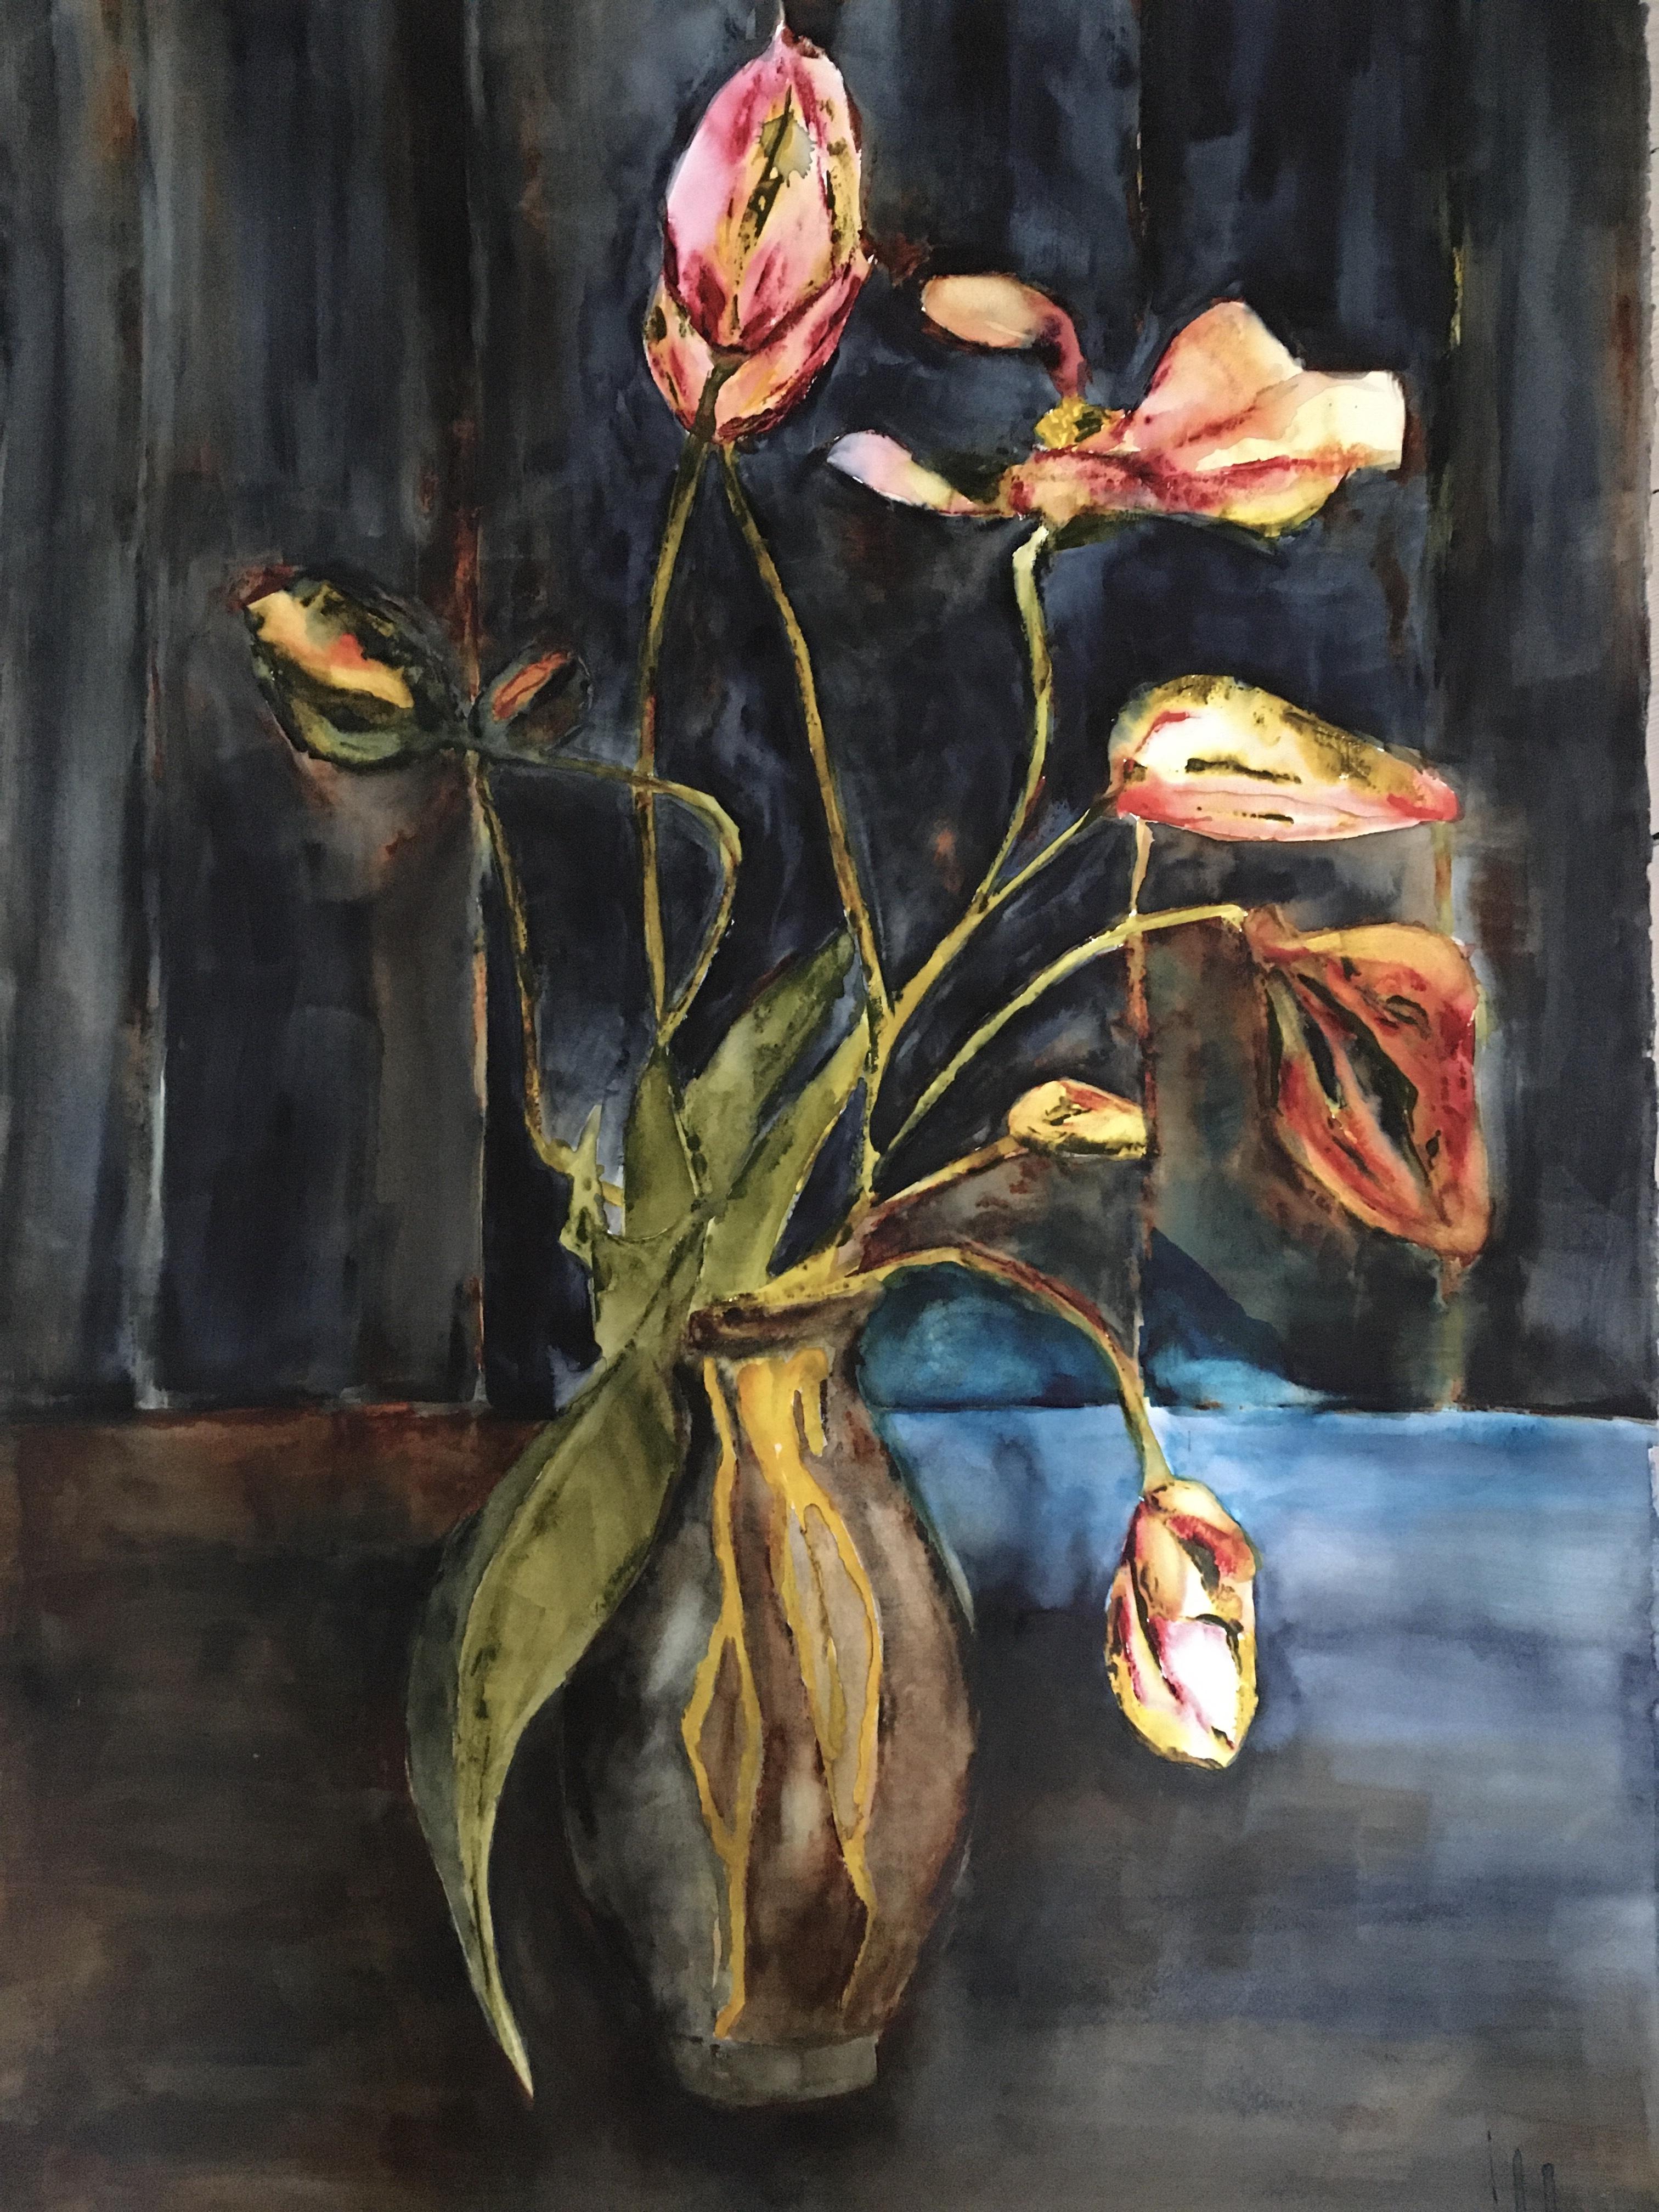 Lena Hoel - Mammas vas, akvarell